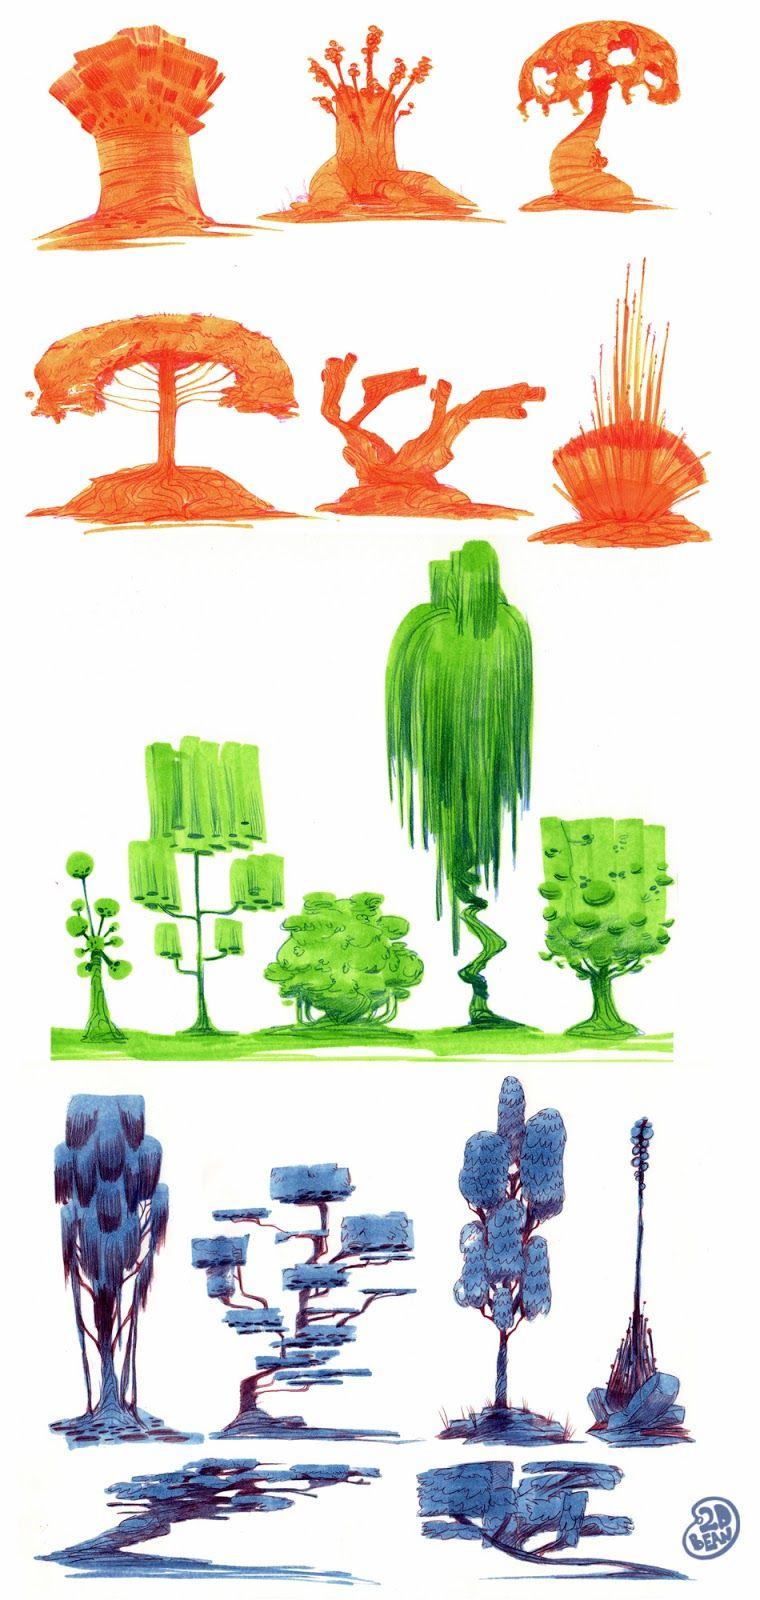 Concept Art To Visual Design